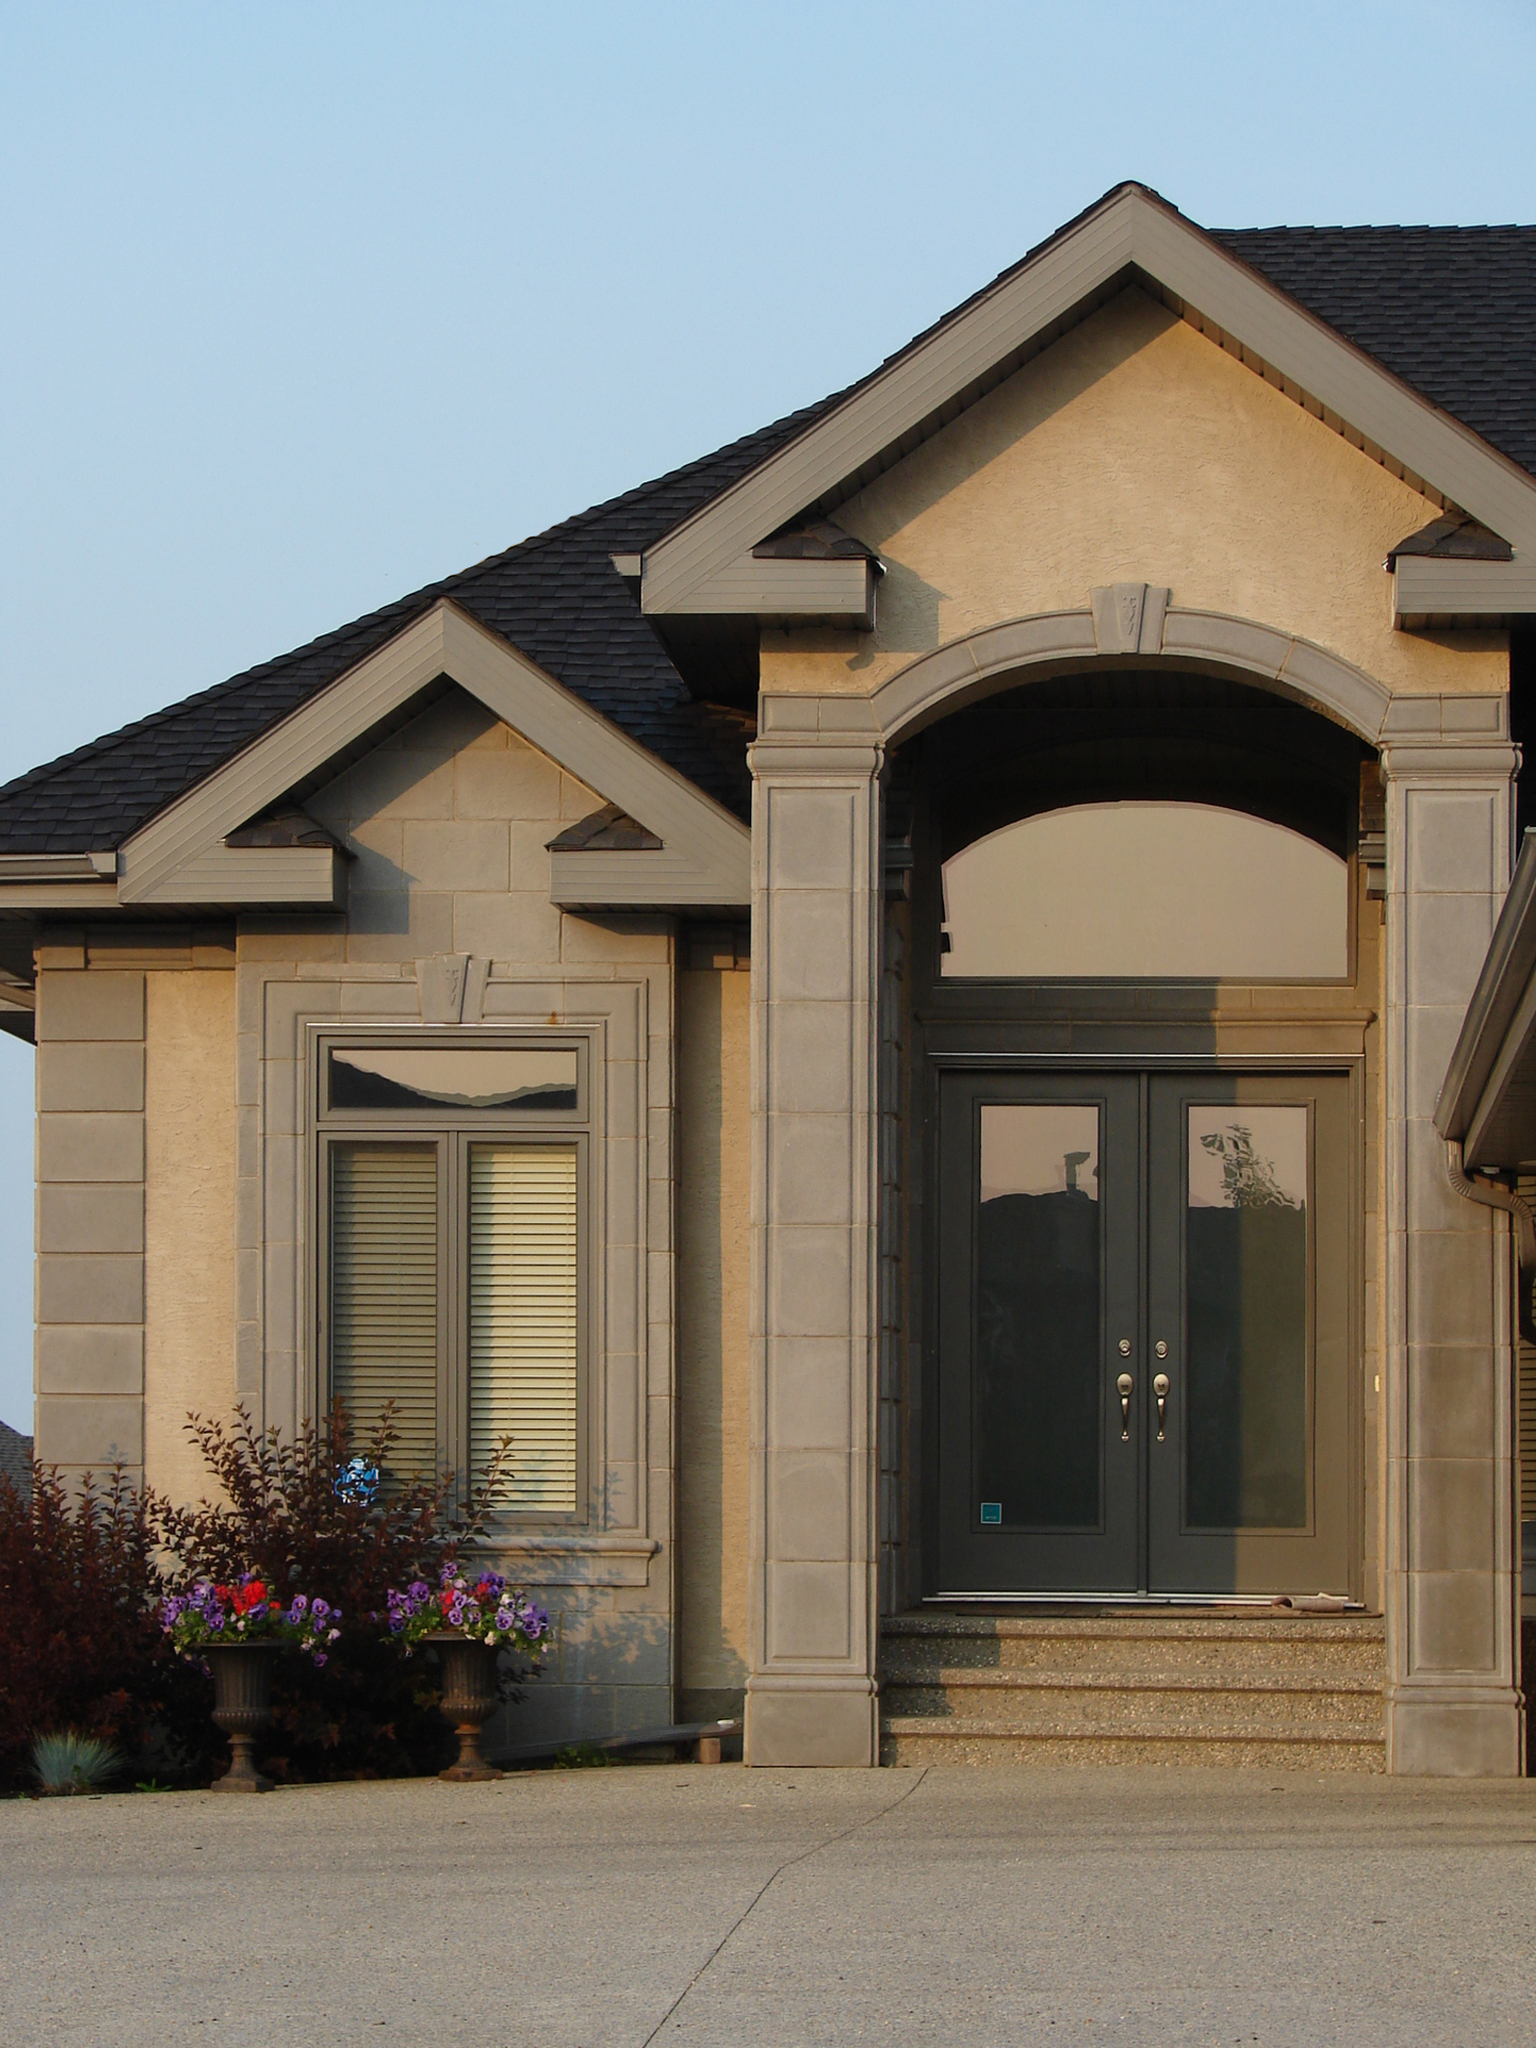 Pillars Accessories - Stonetile Canada